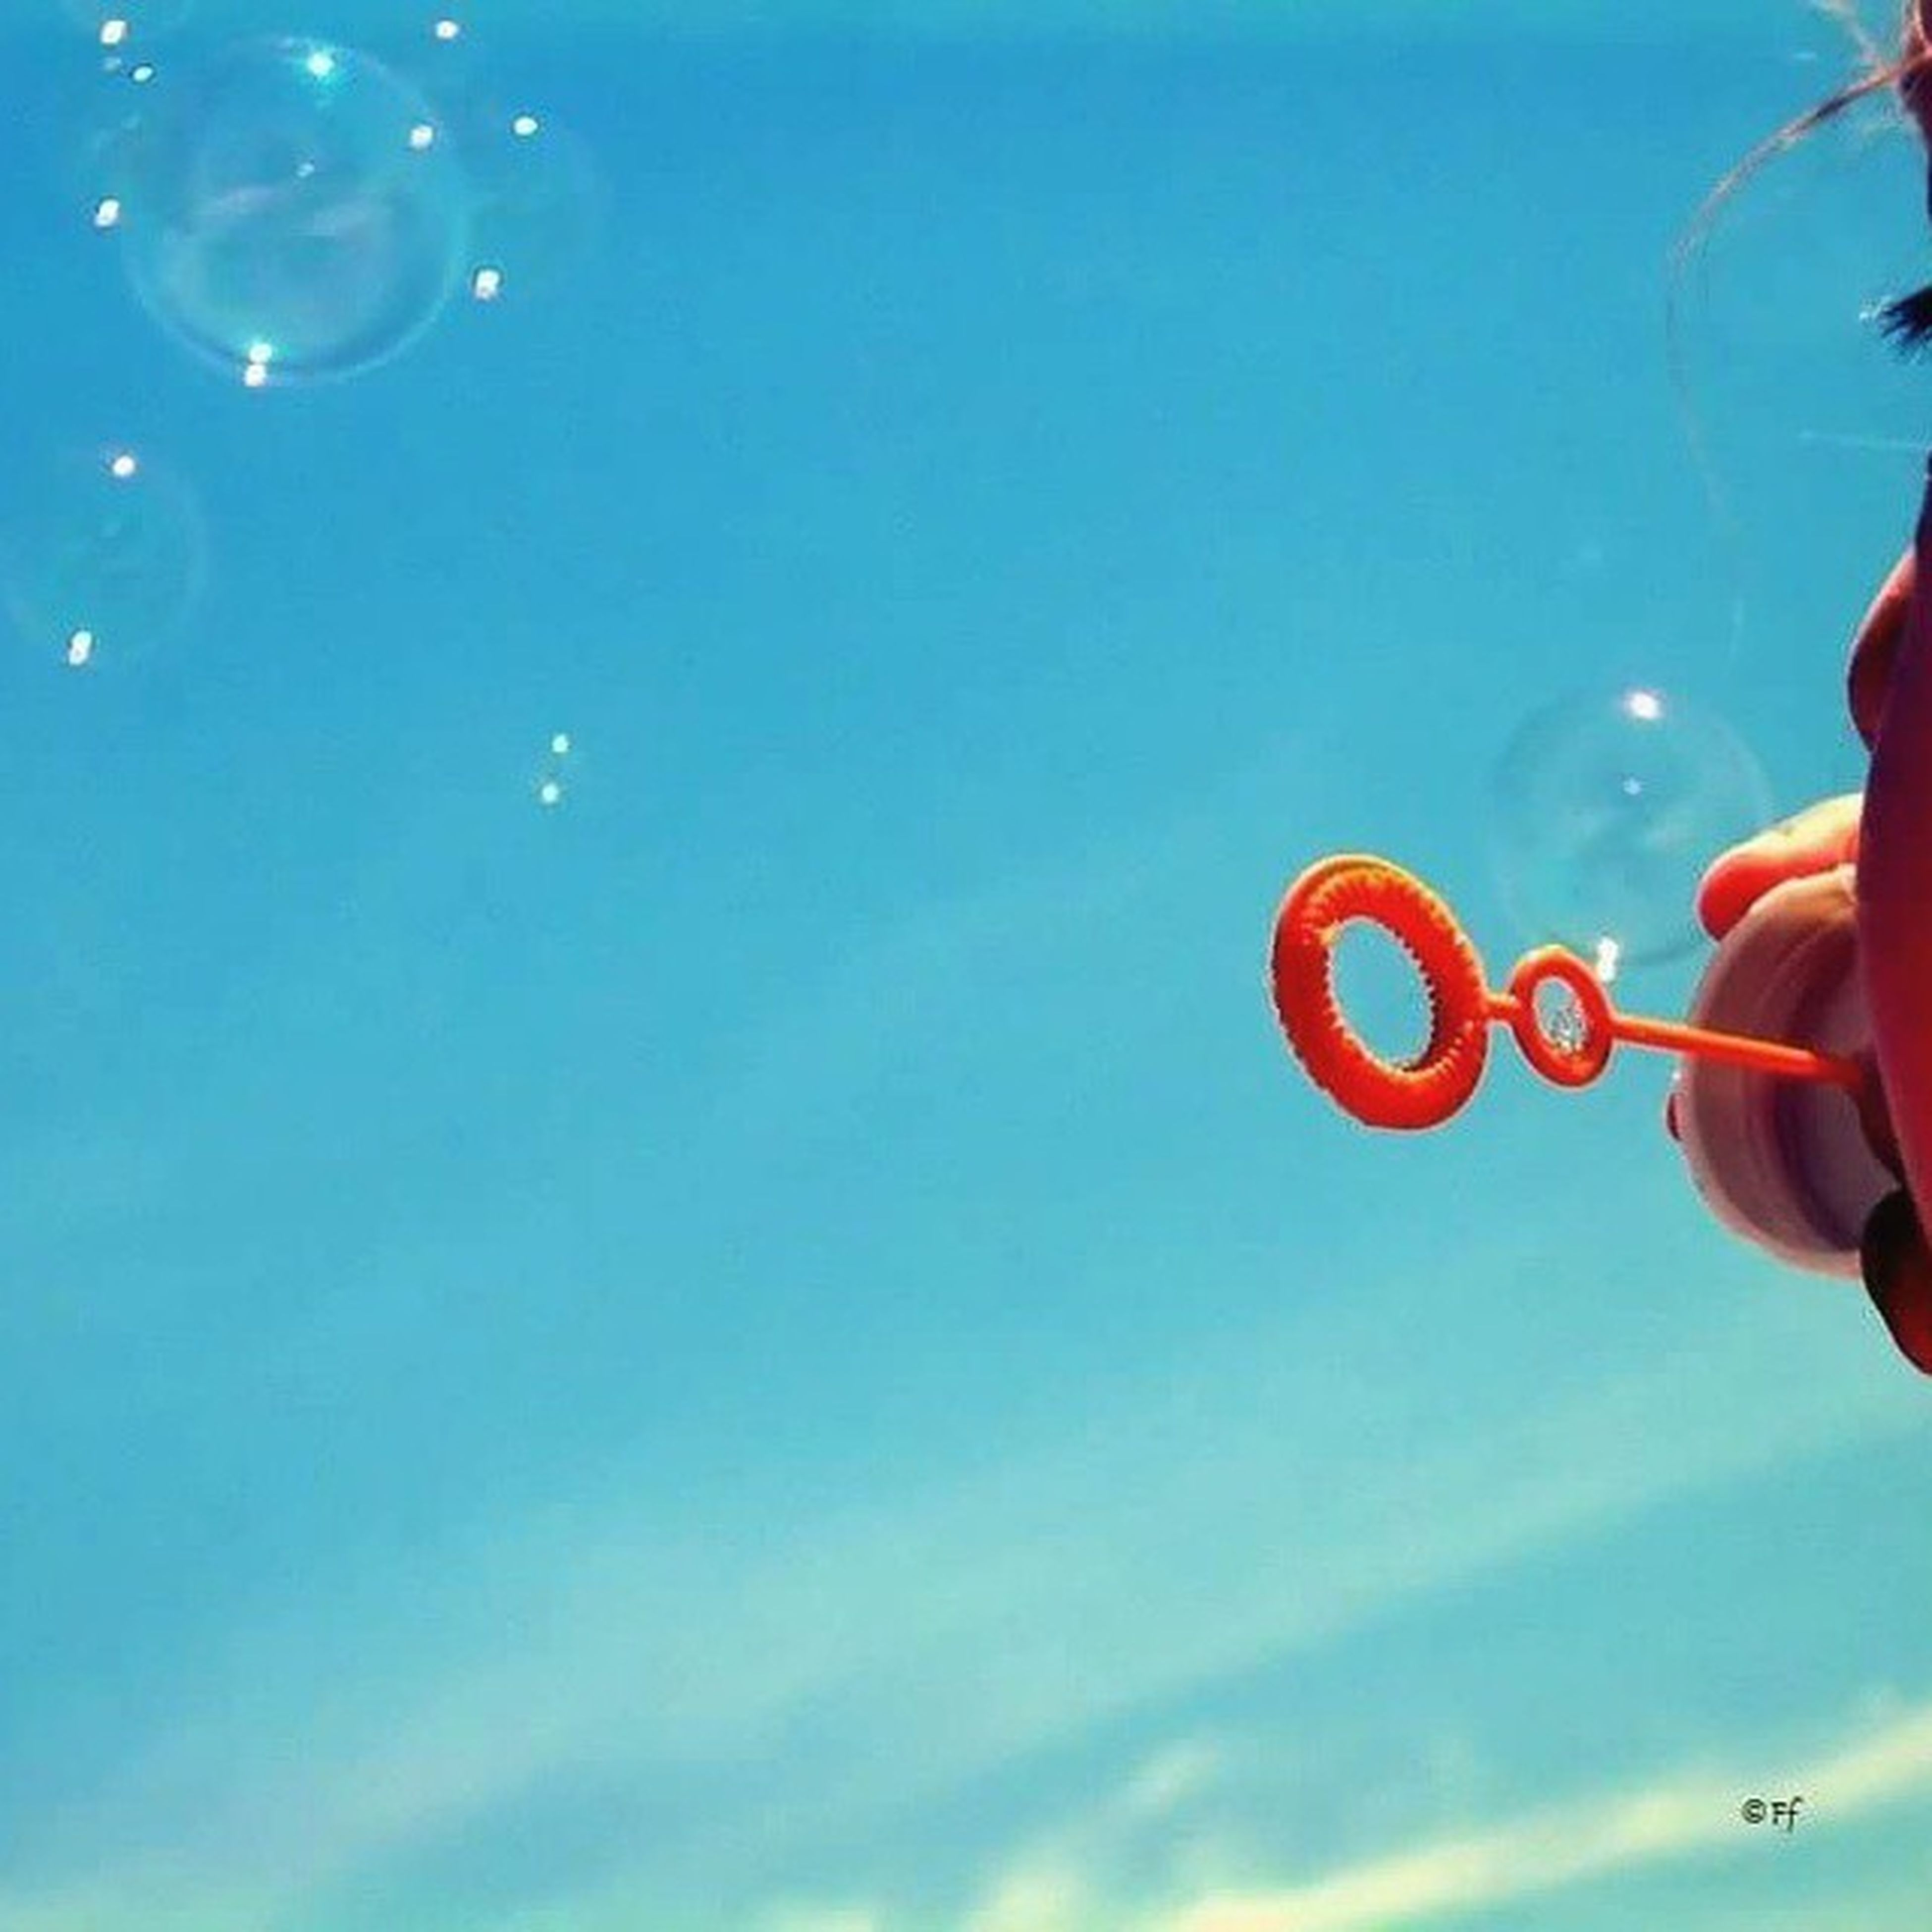 Summer Sky Baloons Soapbaloons Childhood Sky My niece.